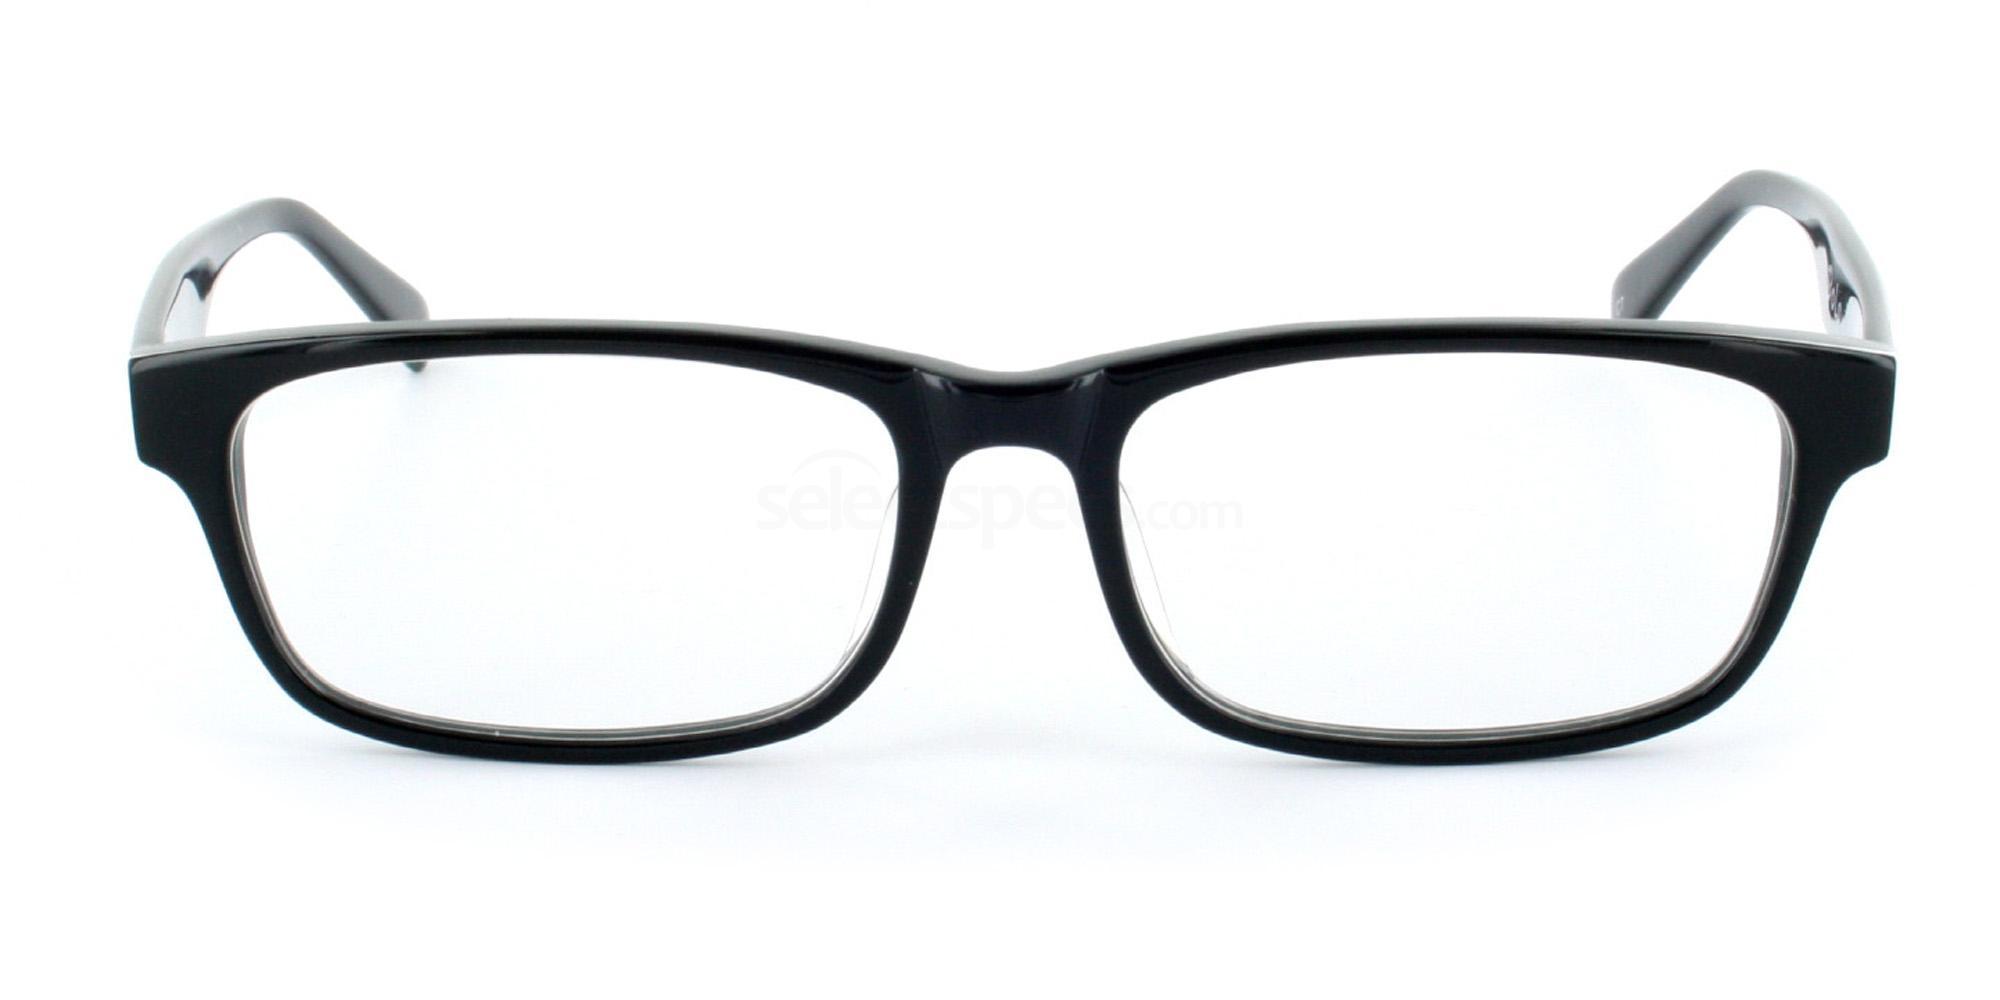 C7 HY81100 Glasses, Hallmark